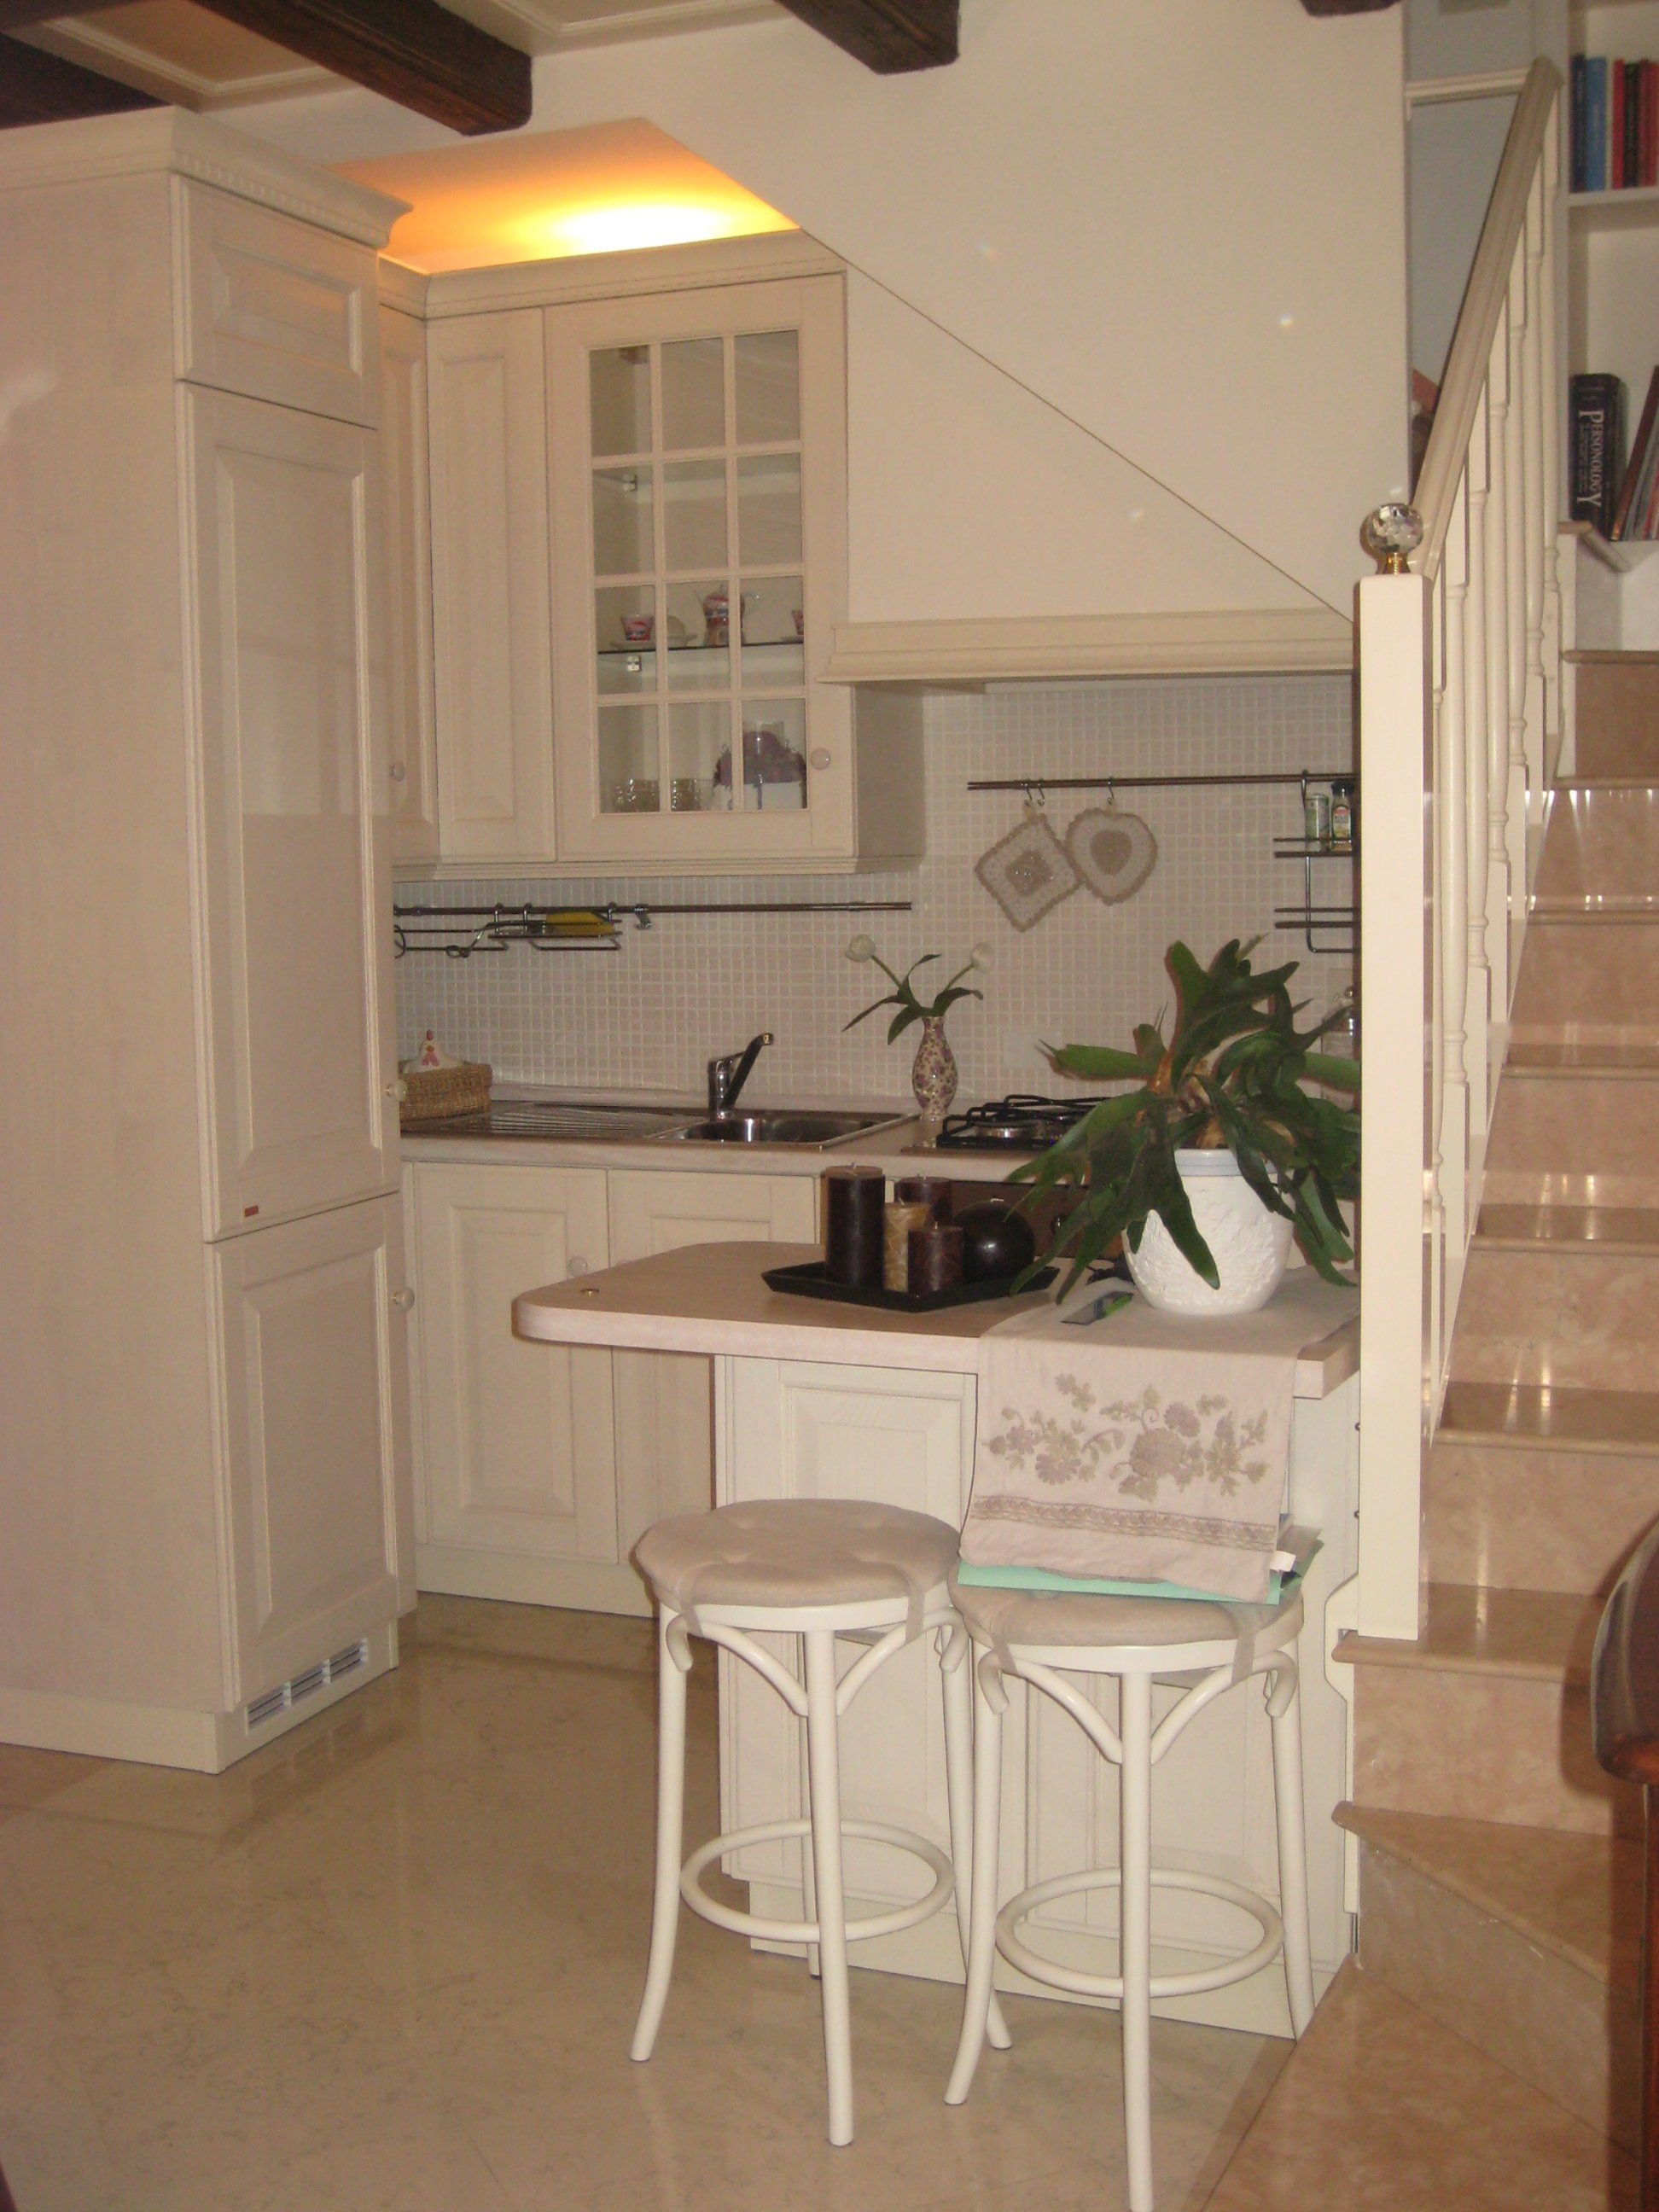 Cucina bianca sottoscala chic scavolini classica baltimora - Cucina classica bianca ...